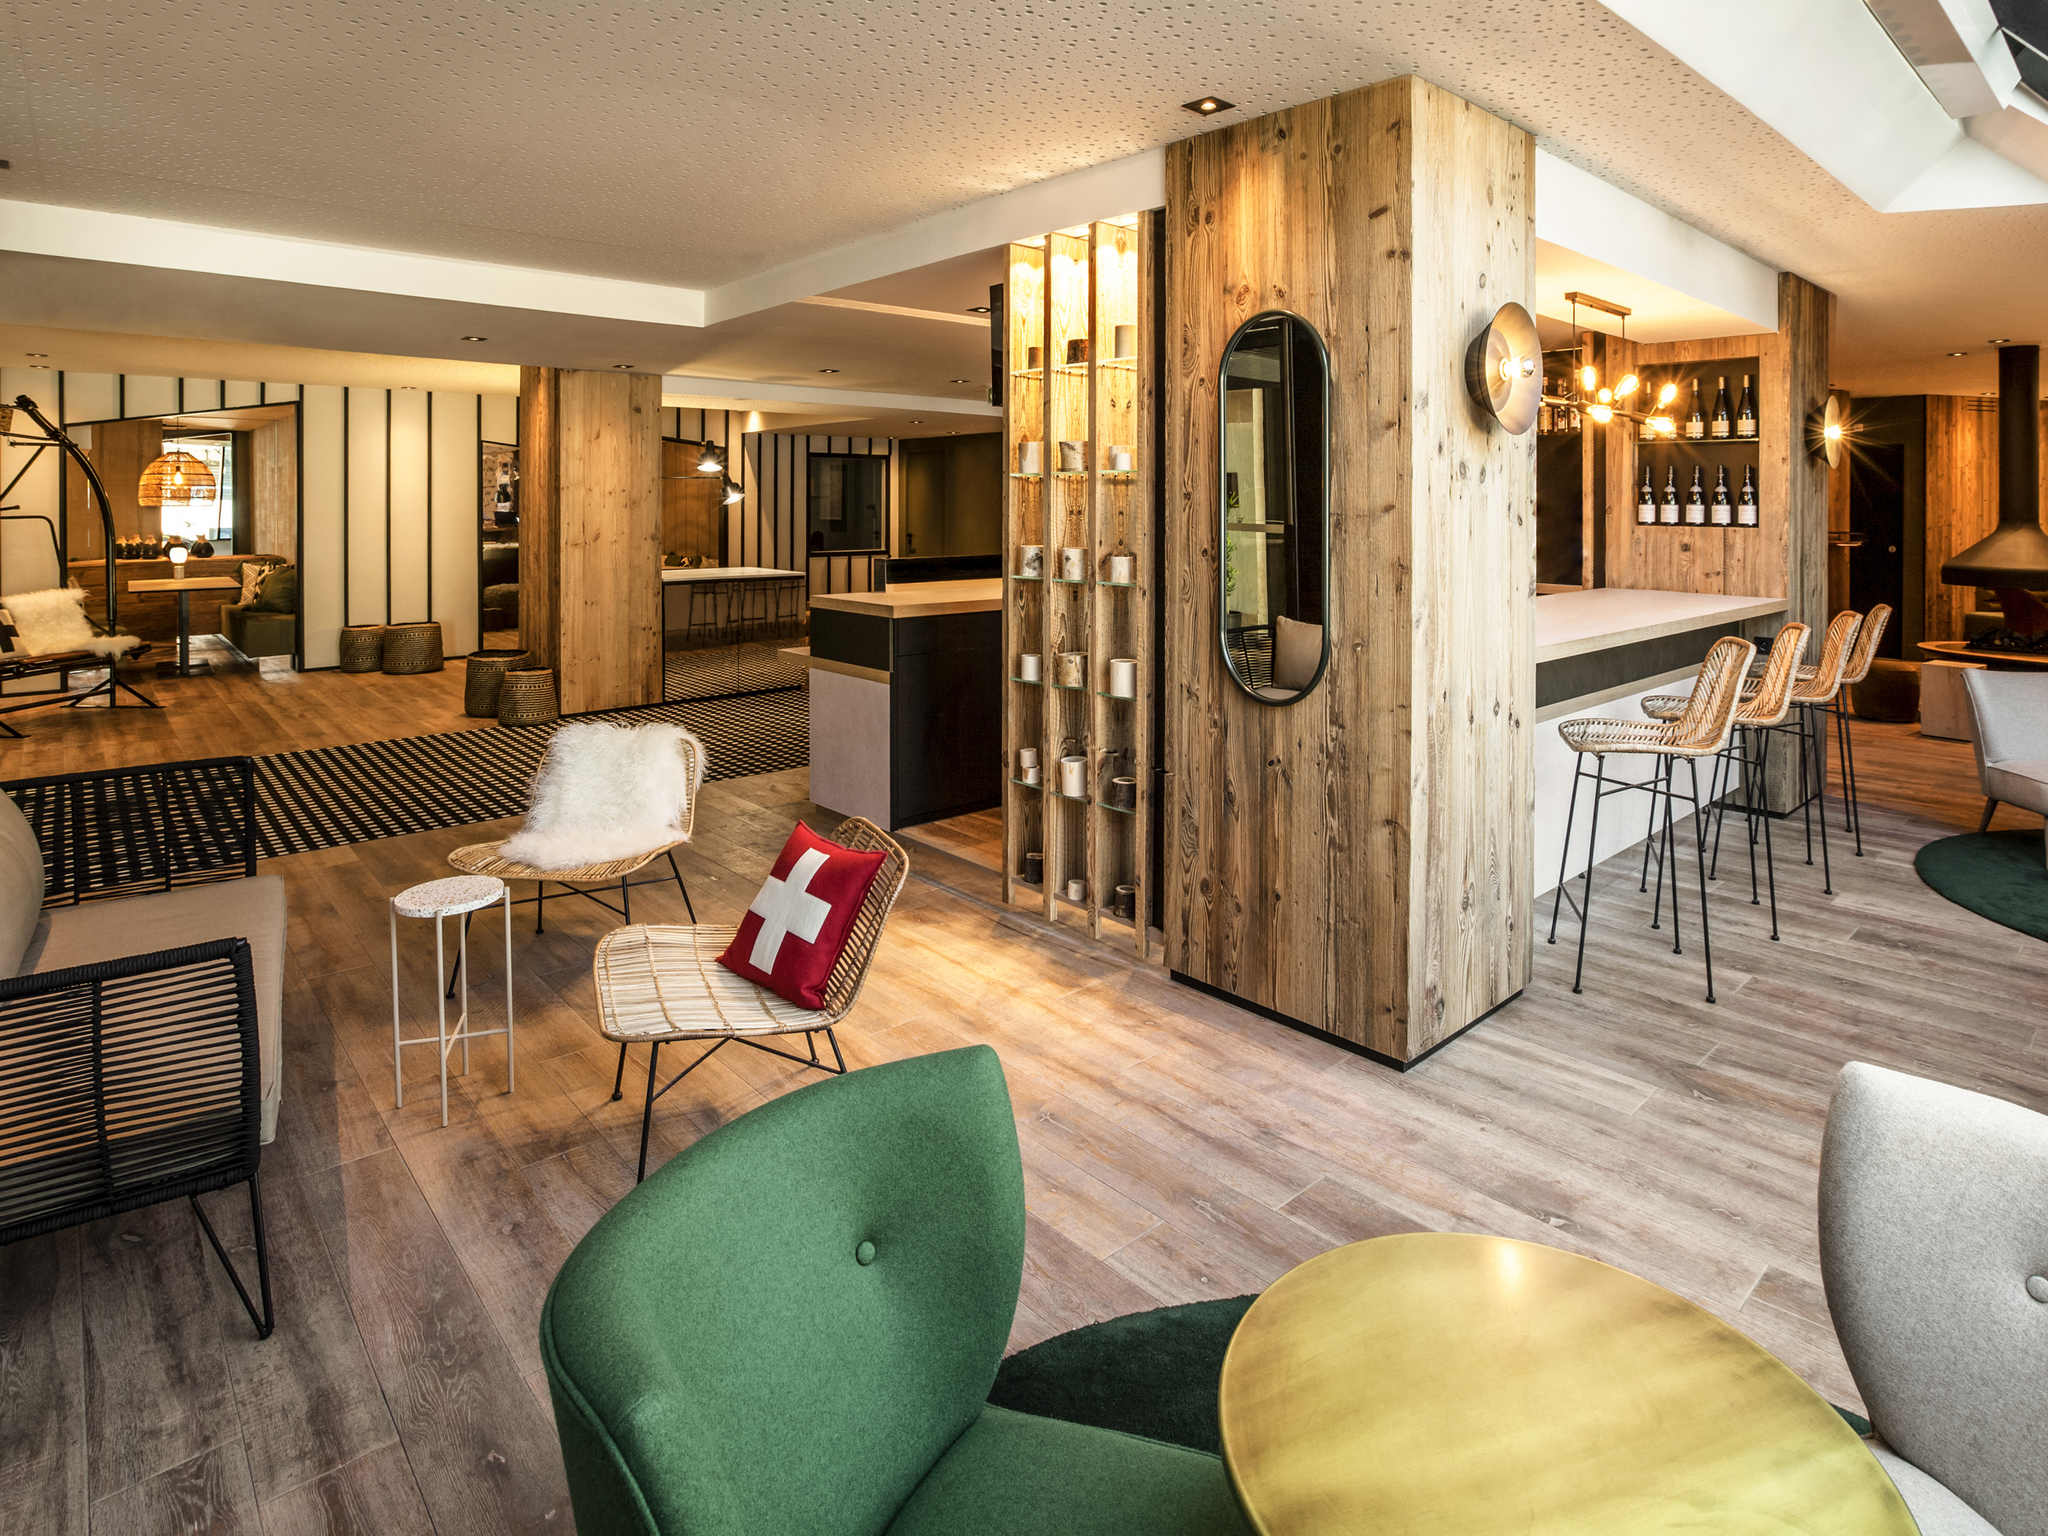 Hotel – Hotel Mercure Chambery Centre